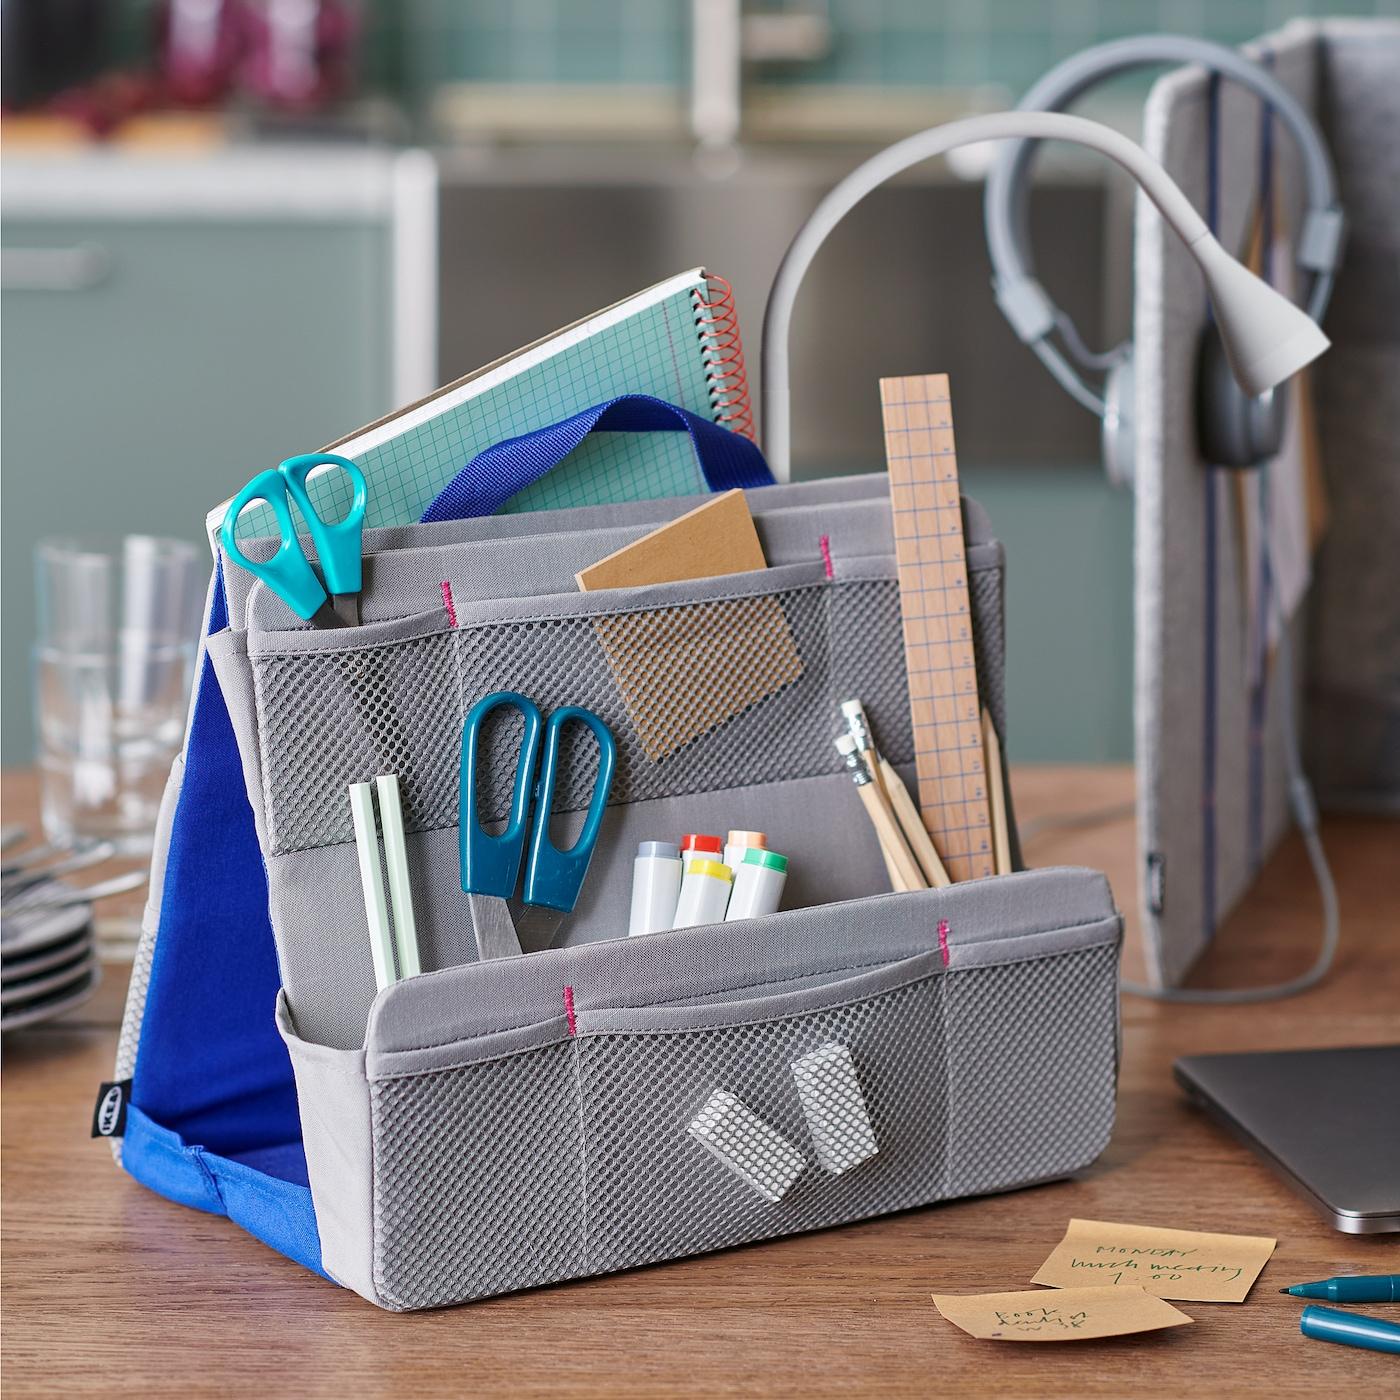 ÖVNING Desk accessories organiser, 32x26 cm